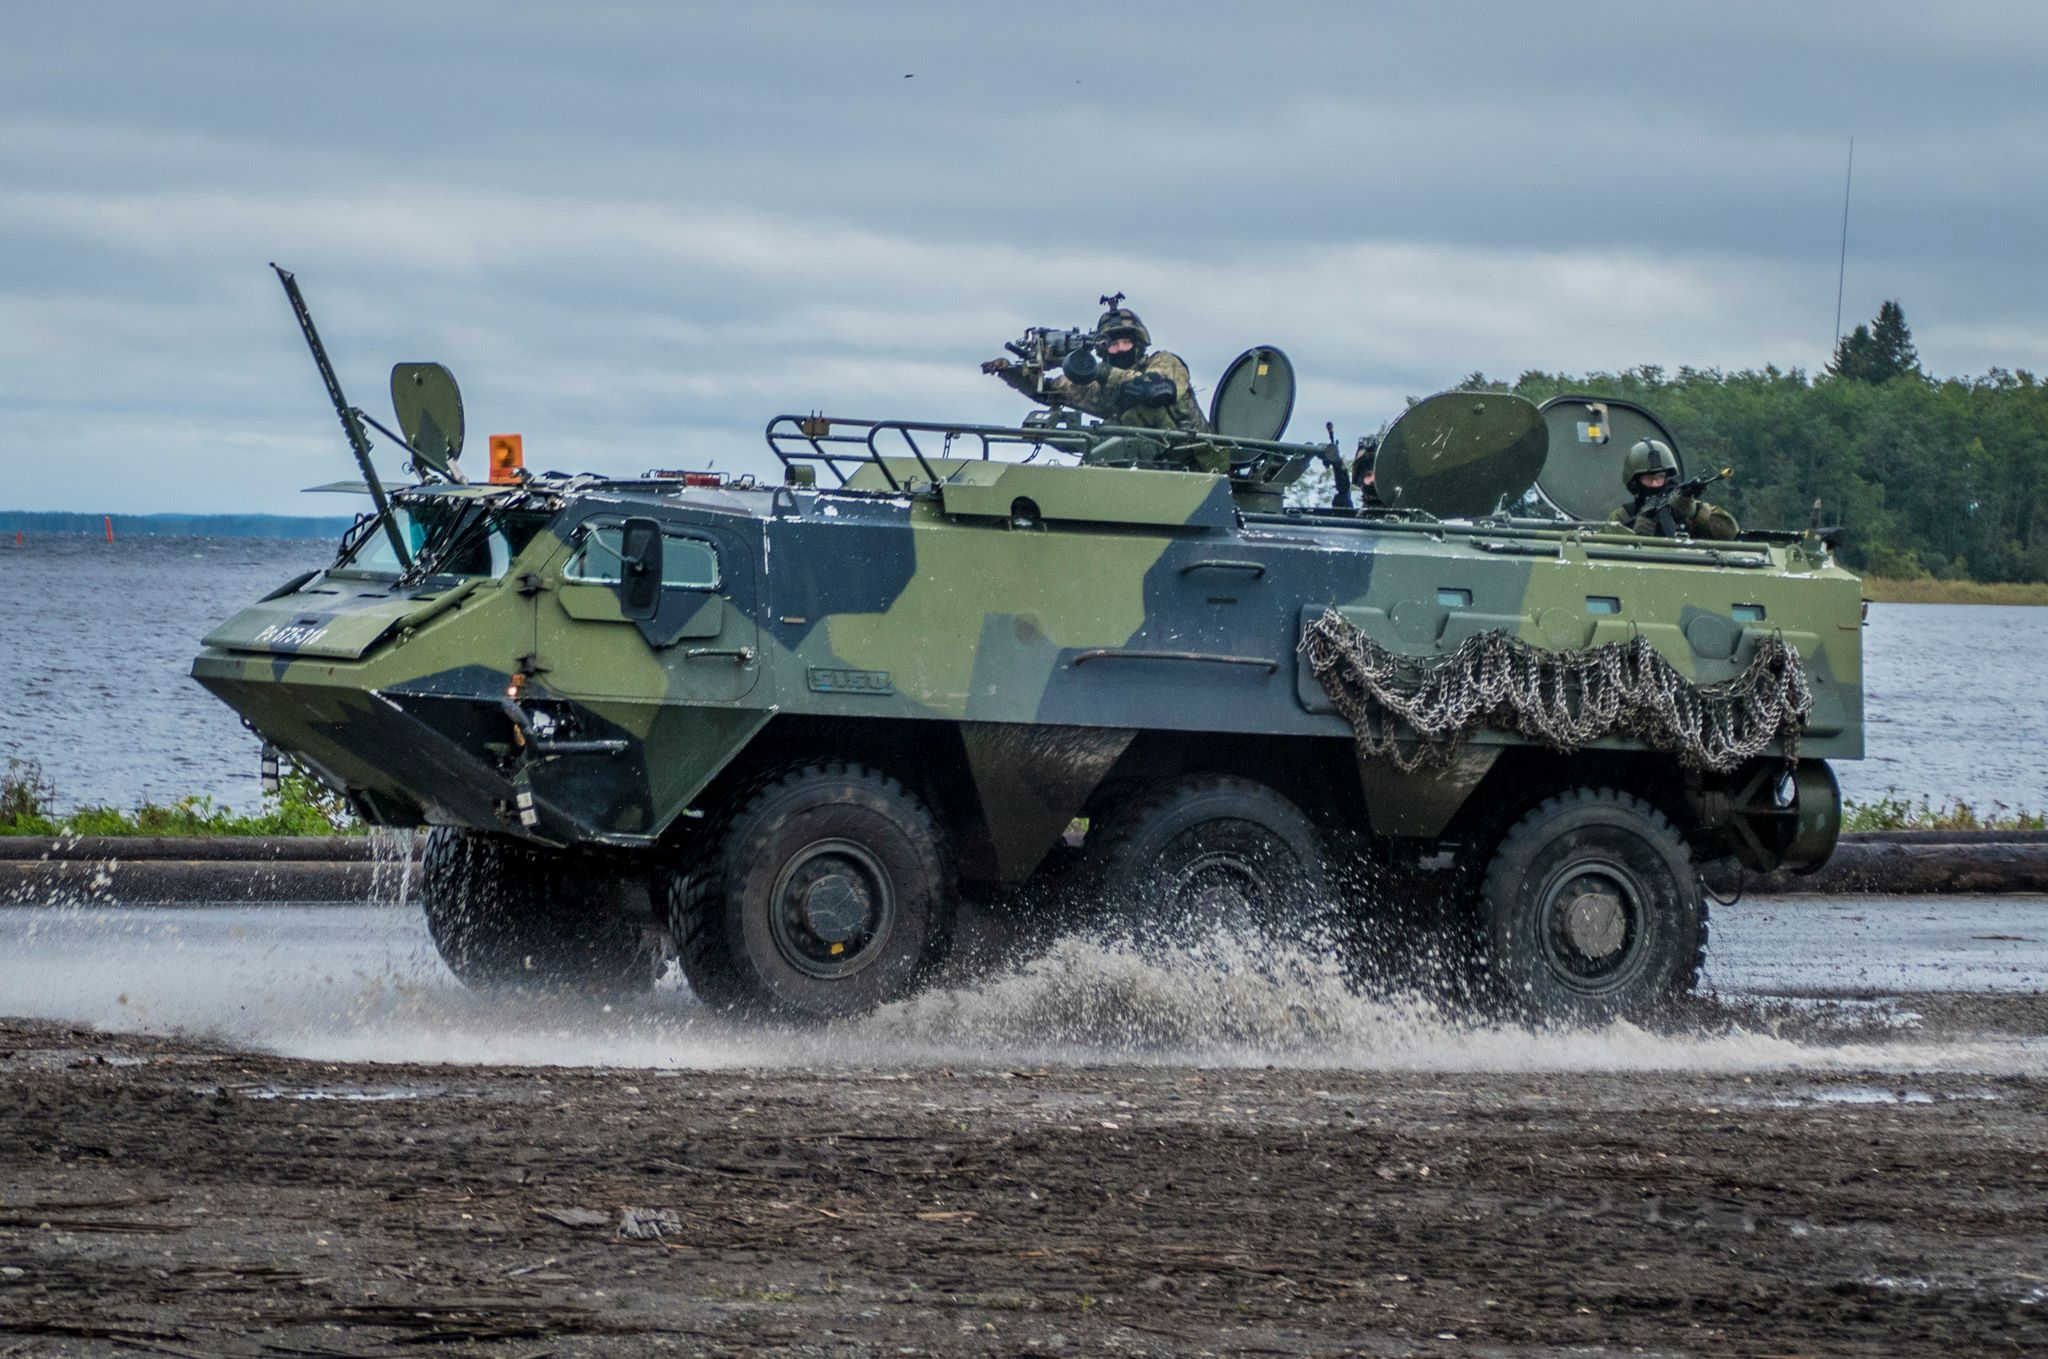 Armée Finlandaise / Finnish Defence Forces / puolustusvoimat - Page 10 41645154_1967698999920146_6918454245201018880_o-jpg